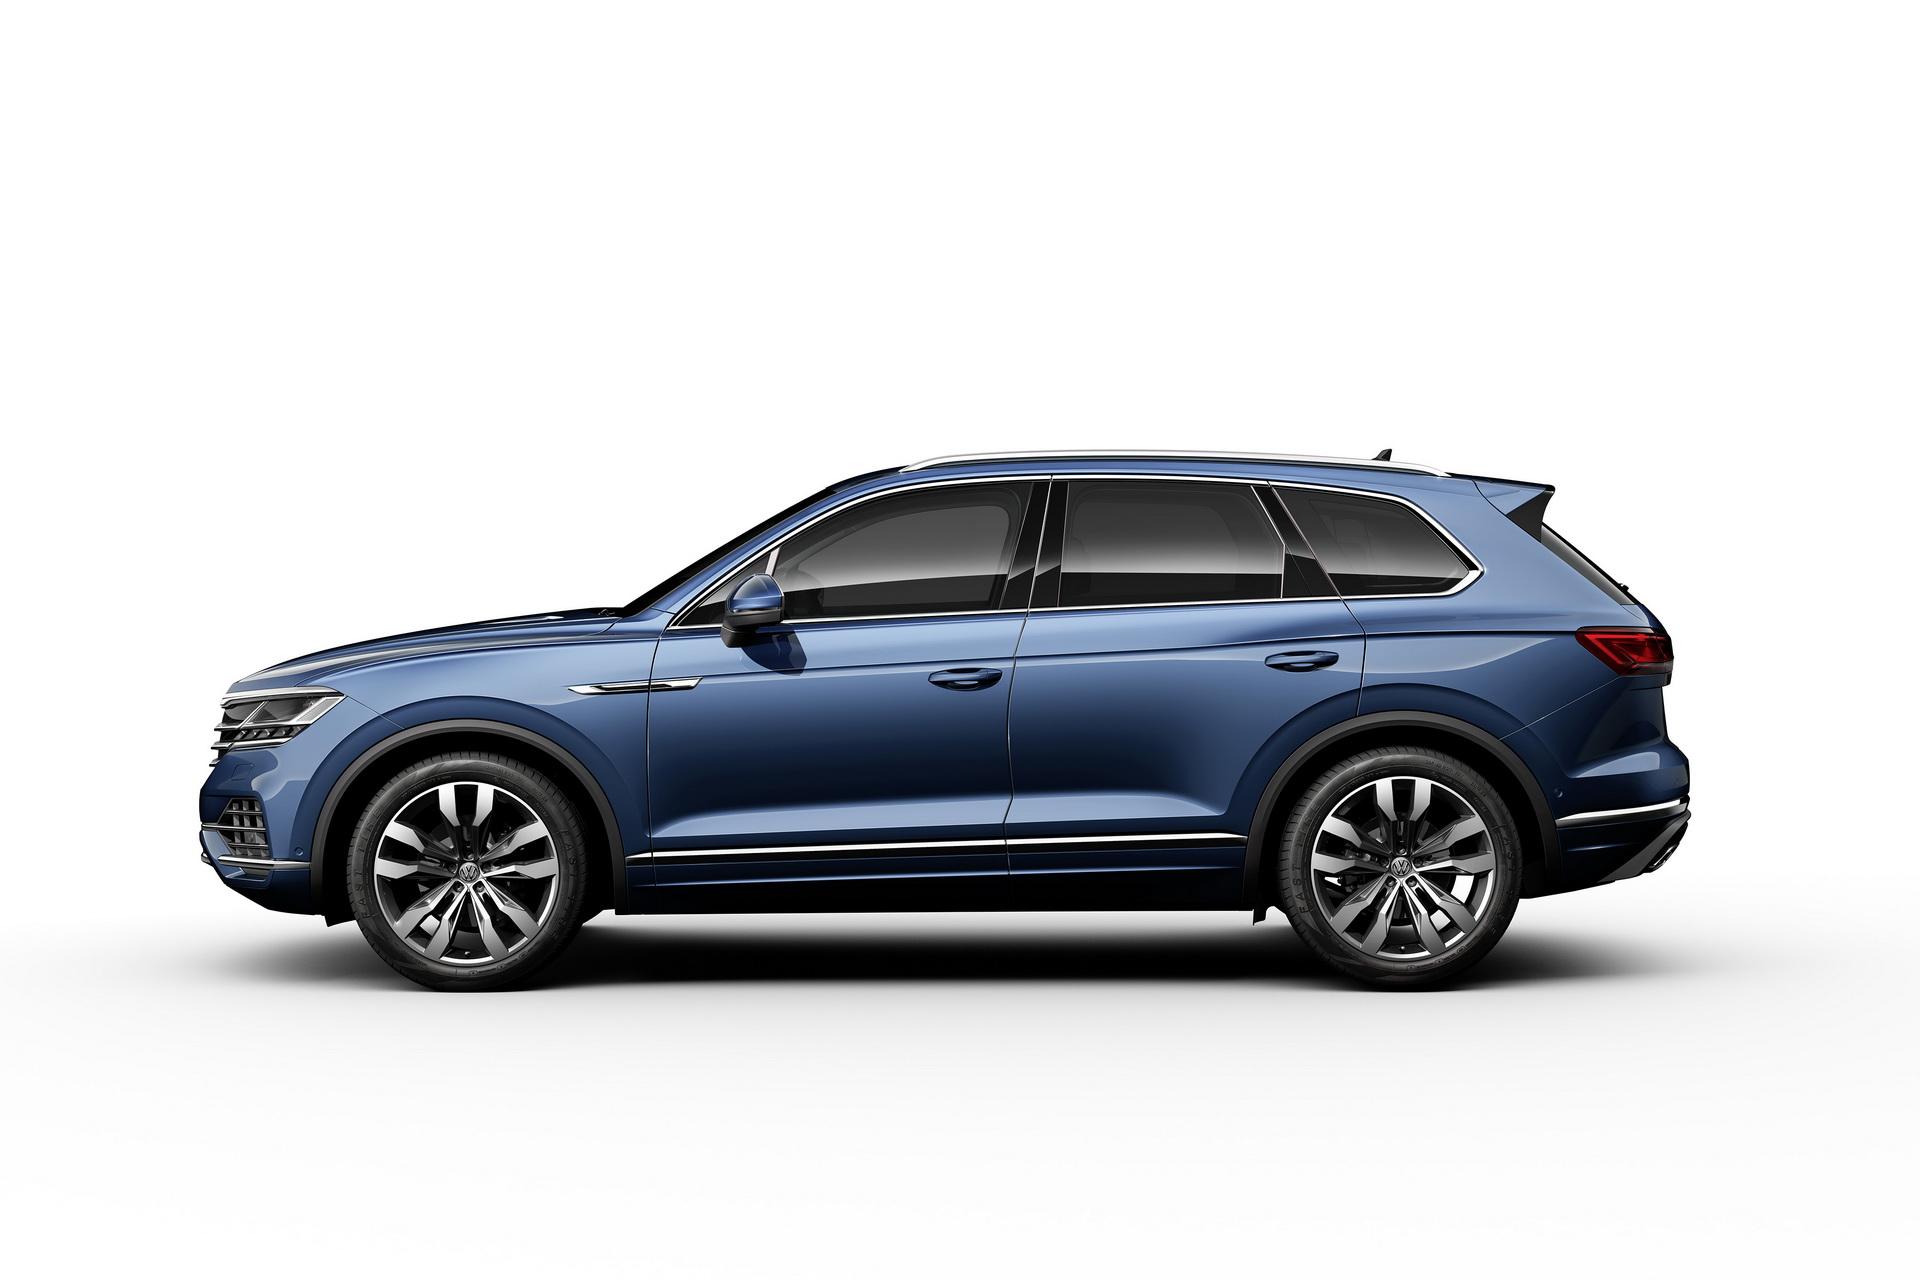 Volkswagen Touareg 2018 (30)